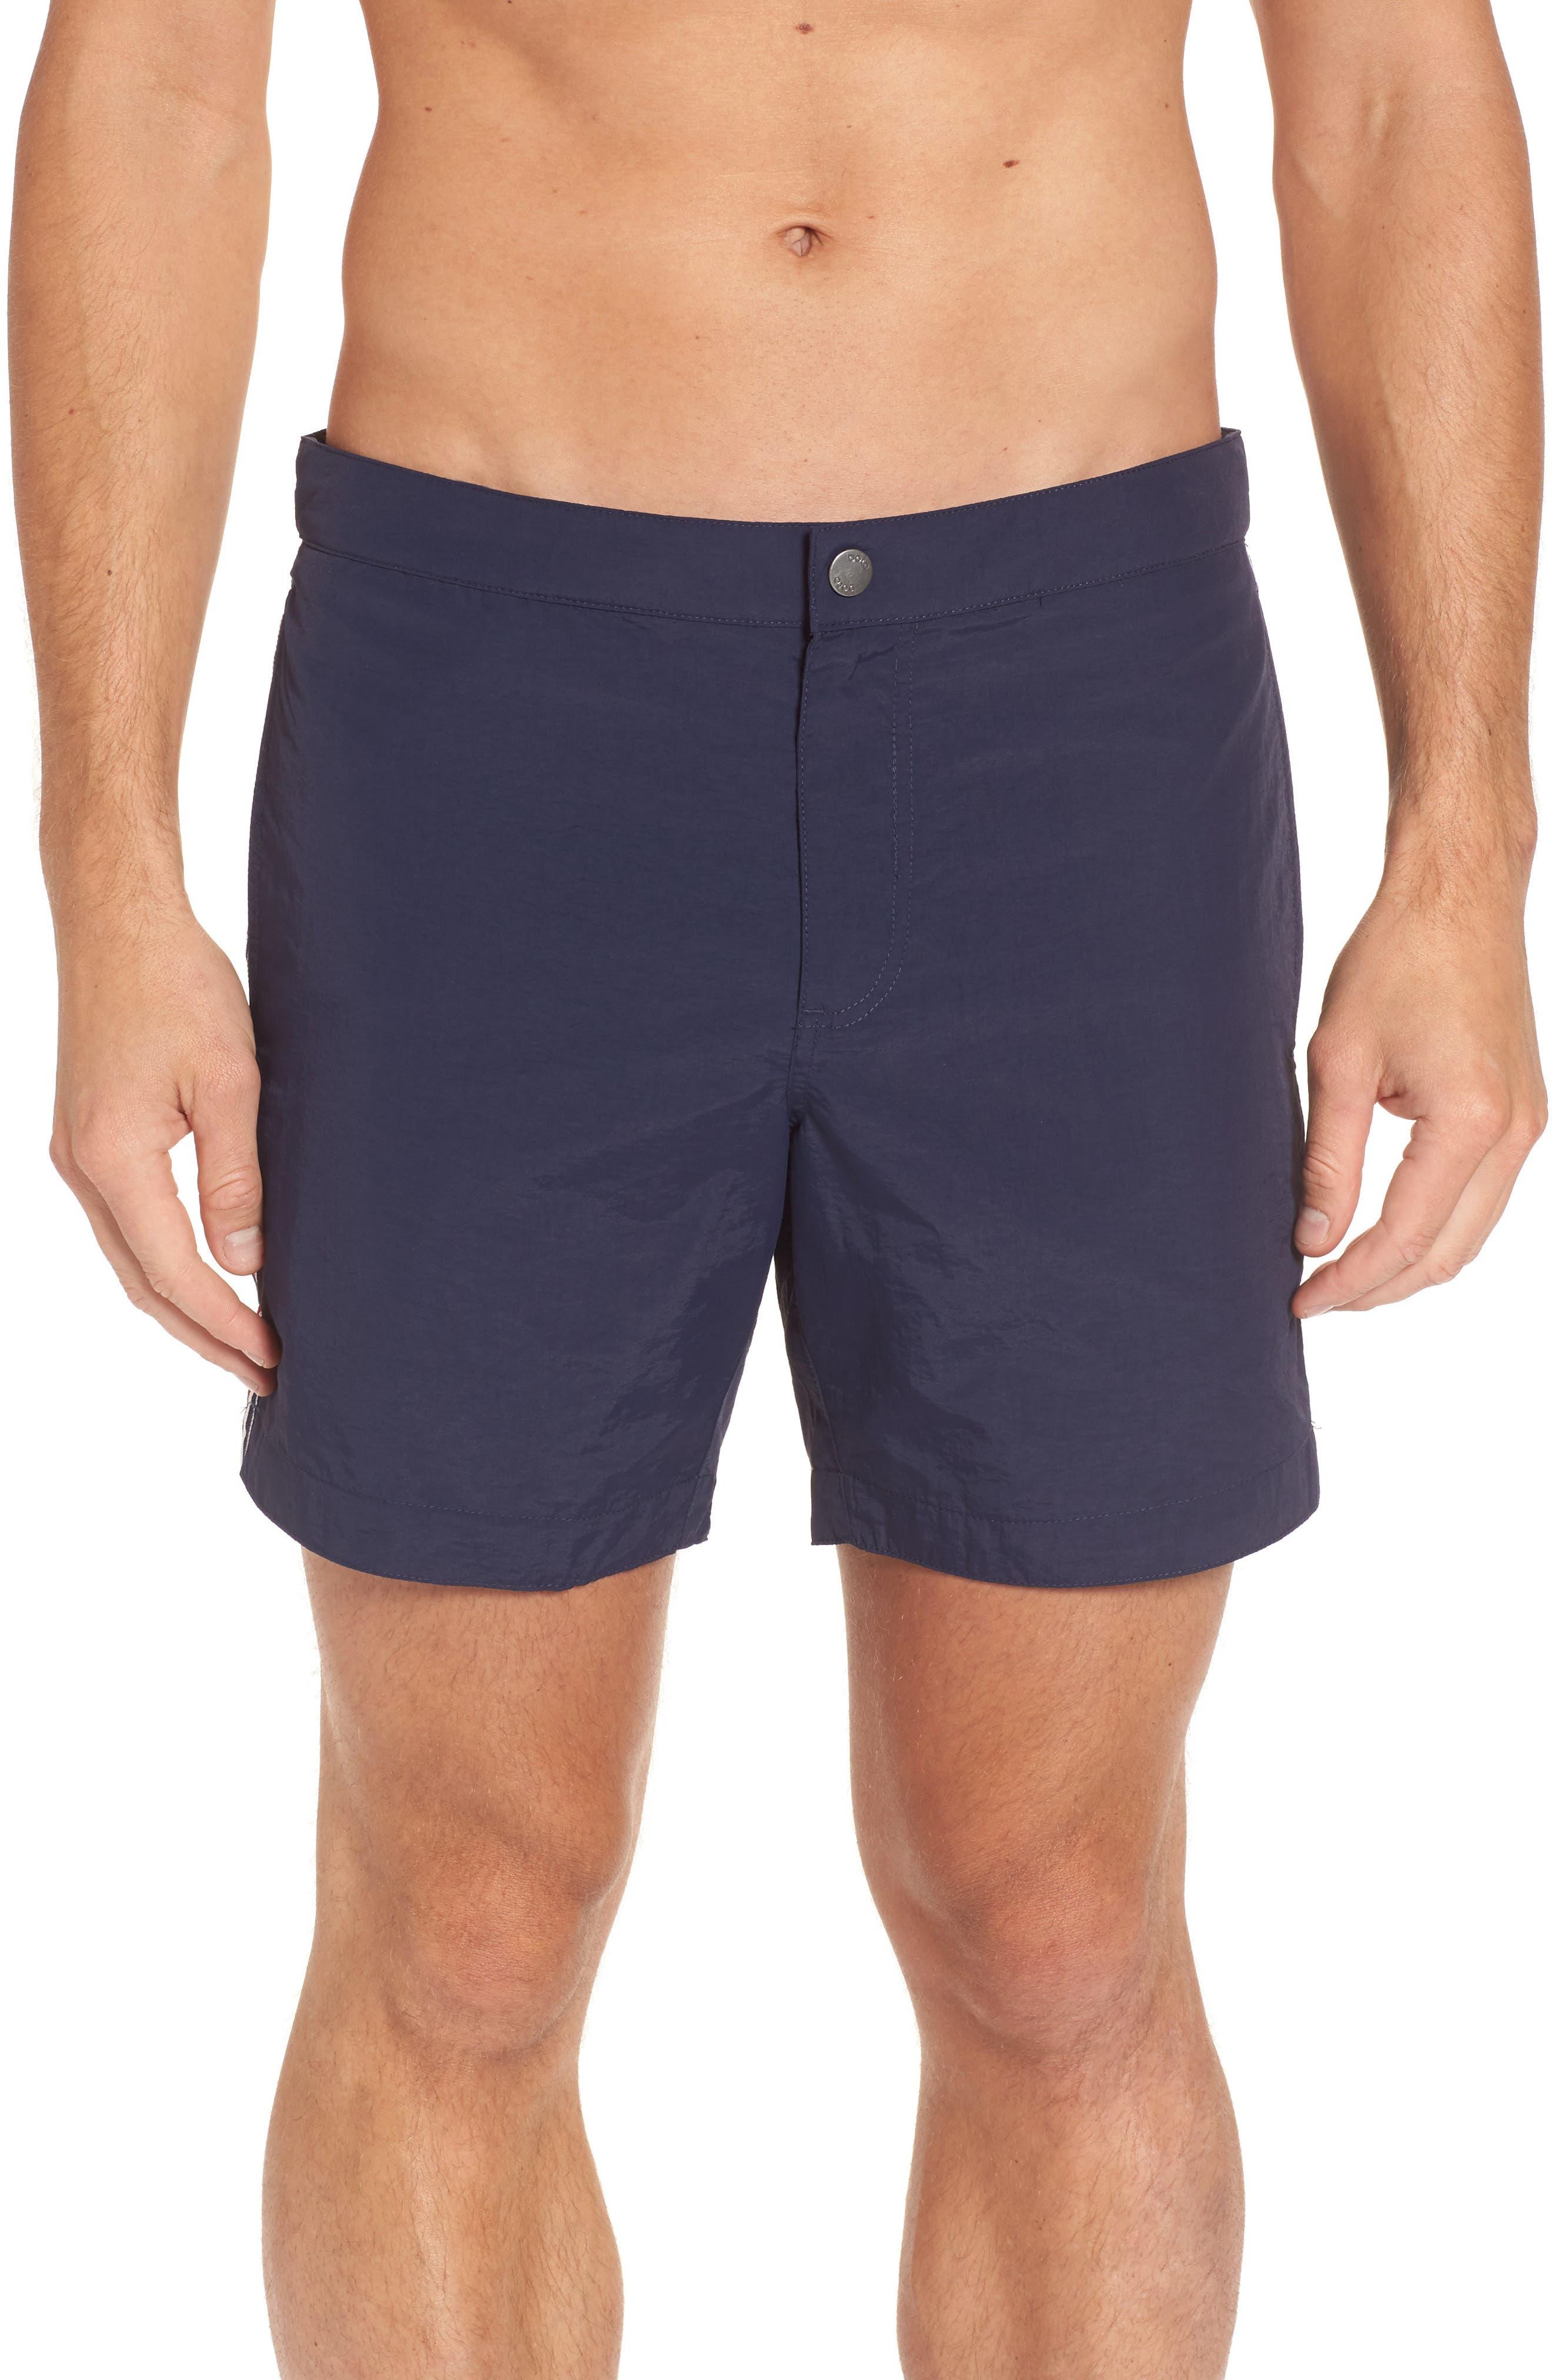 Aruba Tailored Fit French Stripe Swim Trunks,                             Main thumbnail 2, color,